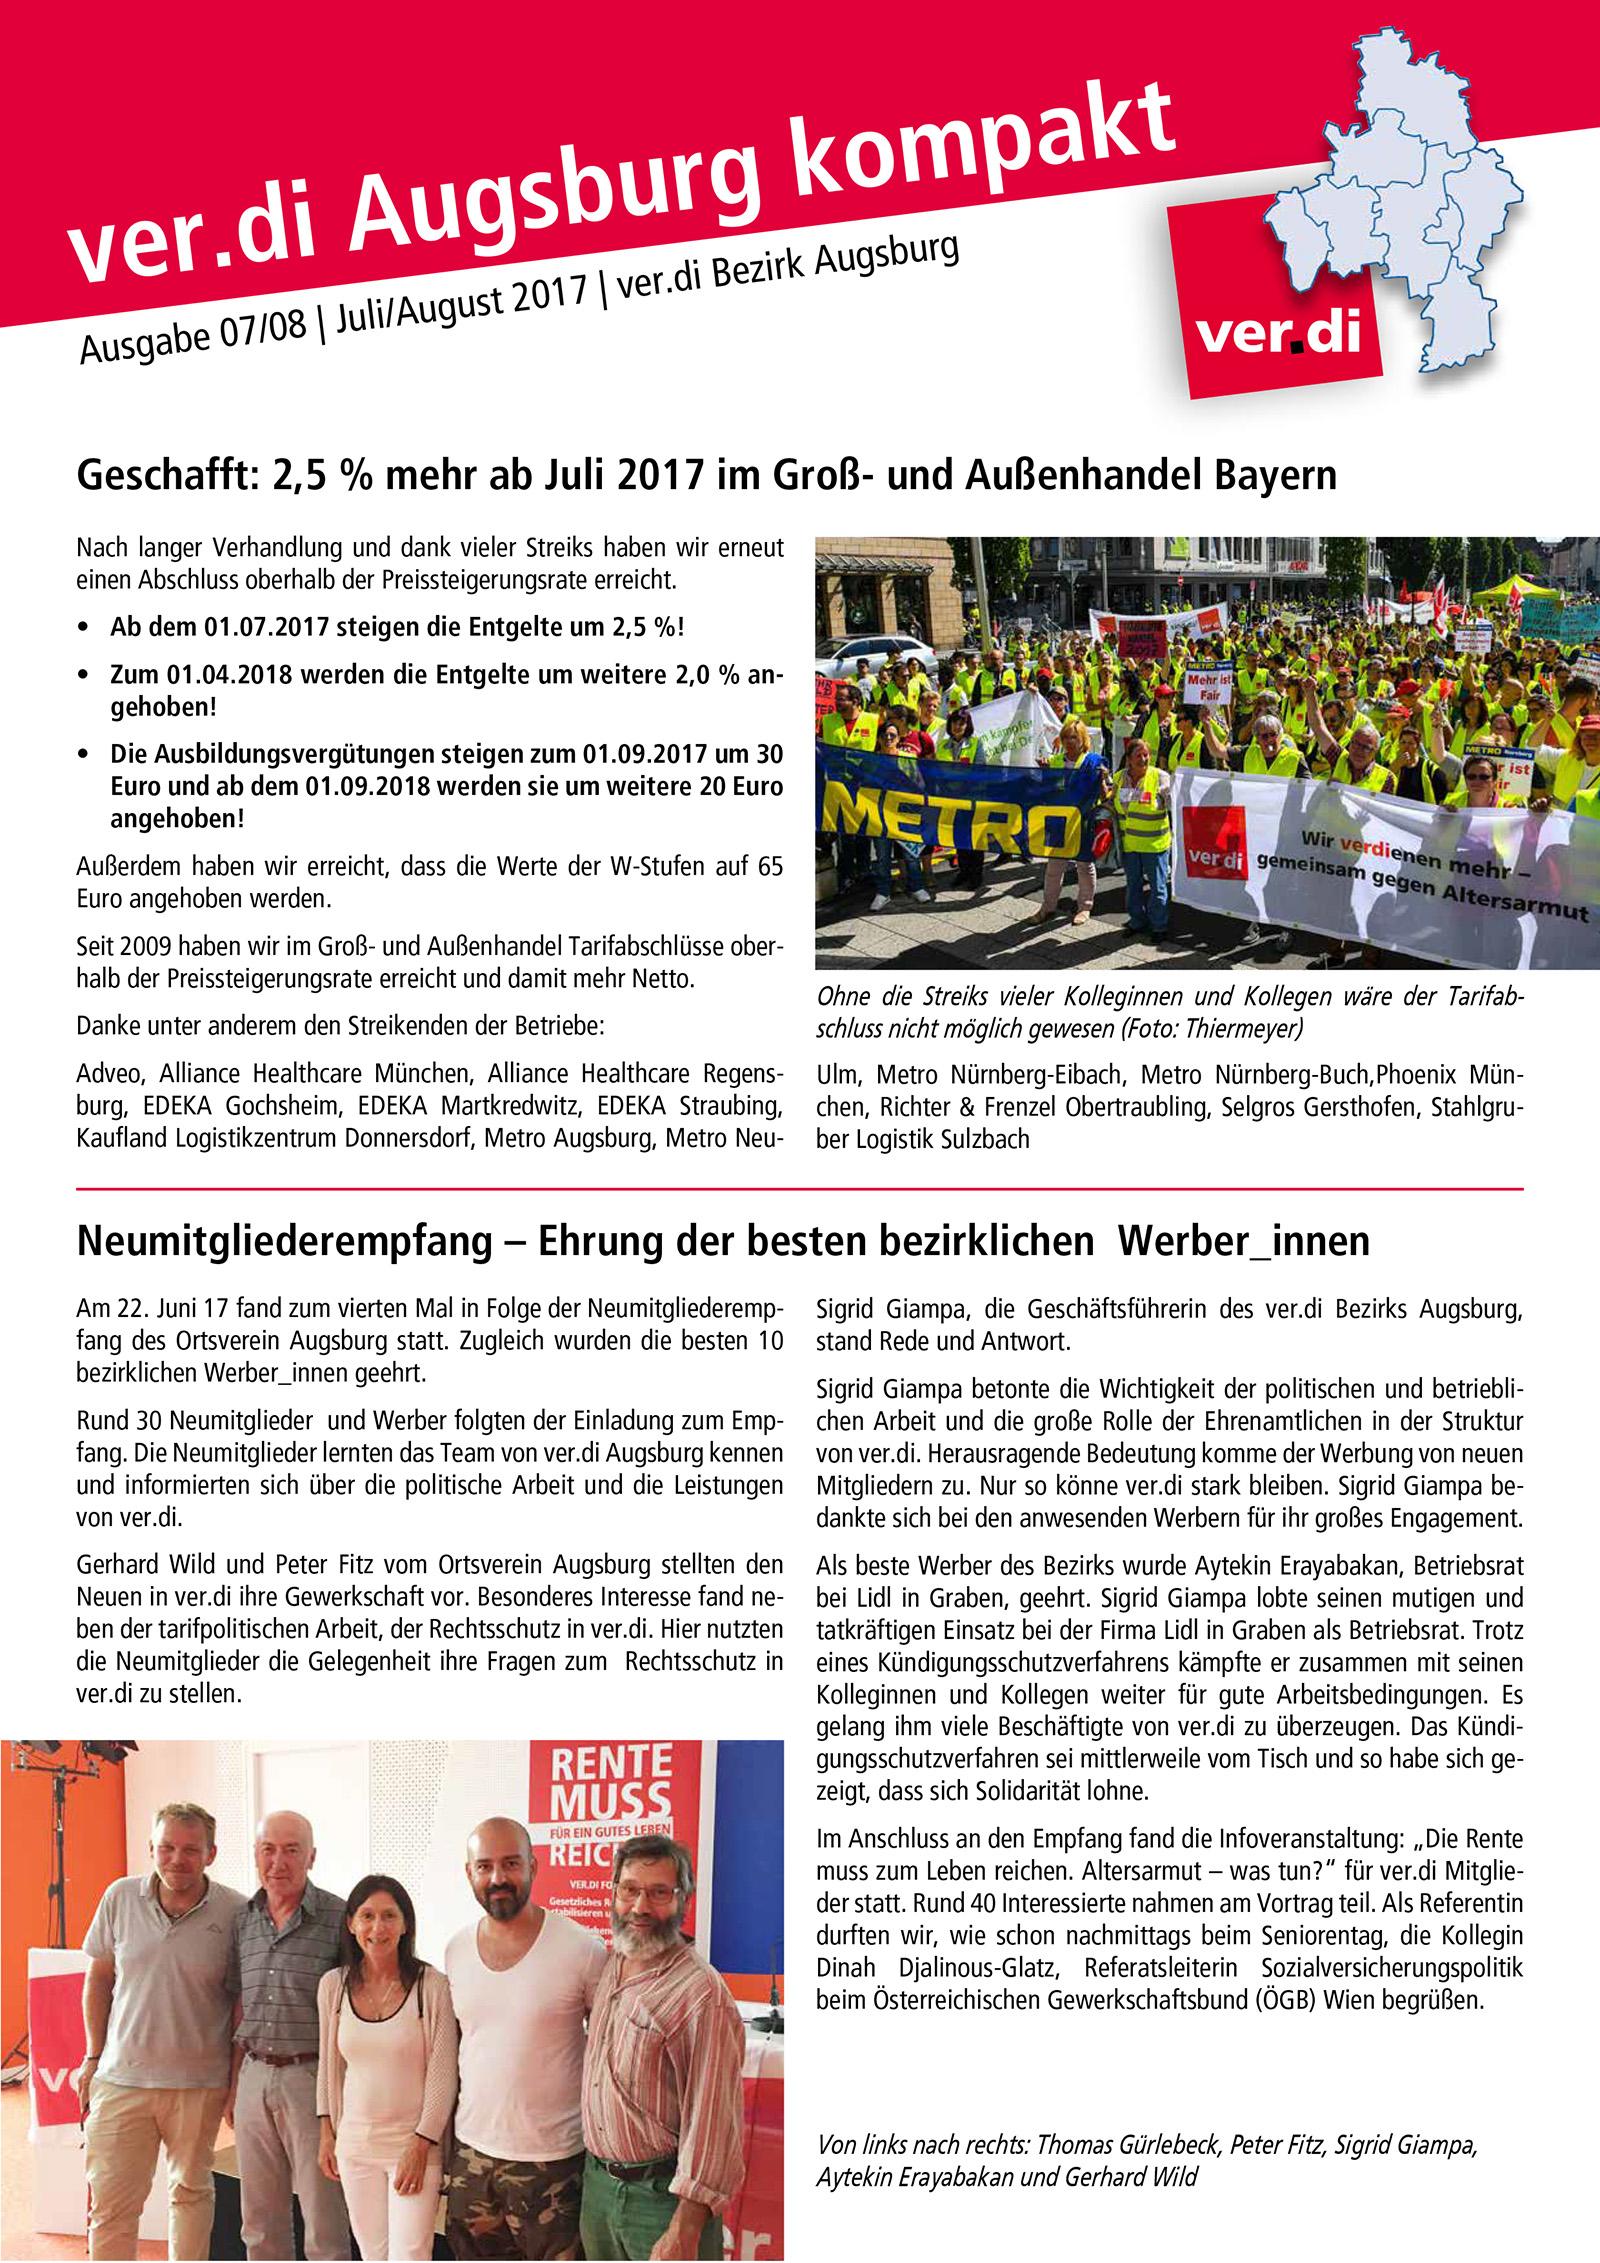 ver.di Augsburg kompakt Ausgabe 07/08 2017